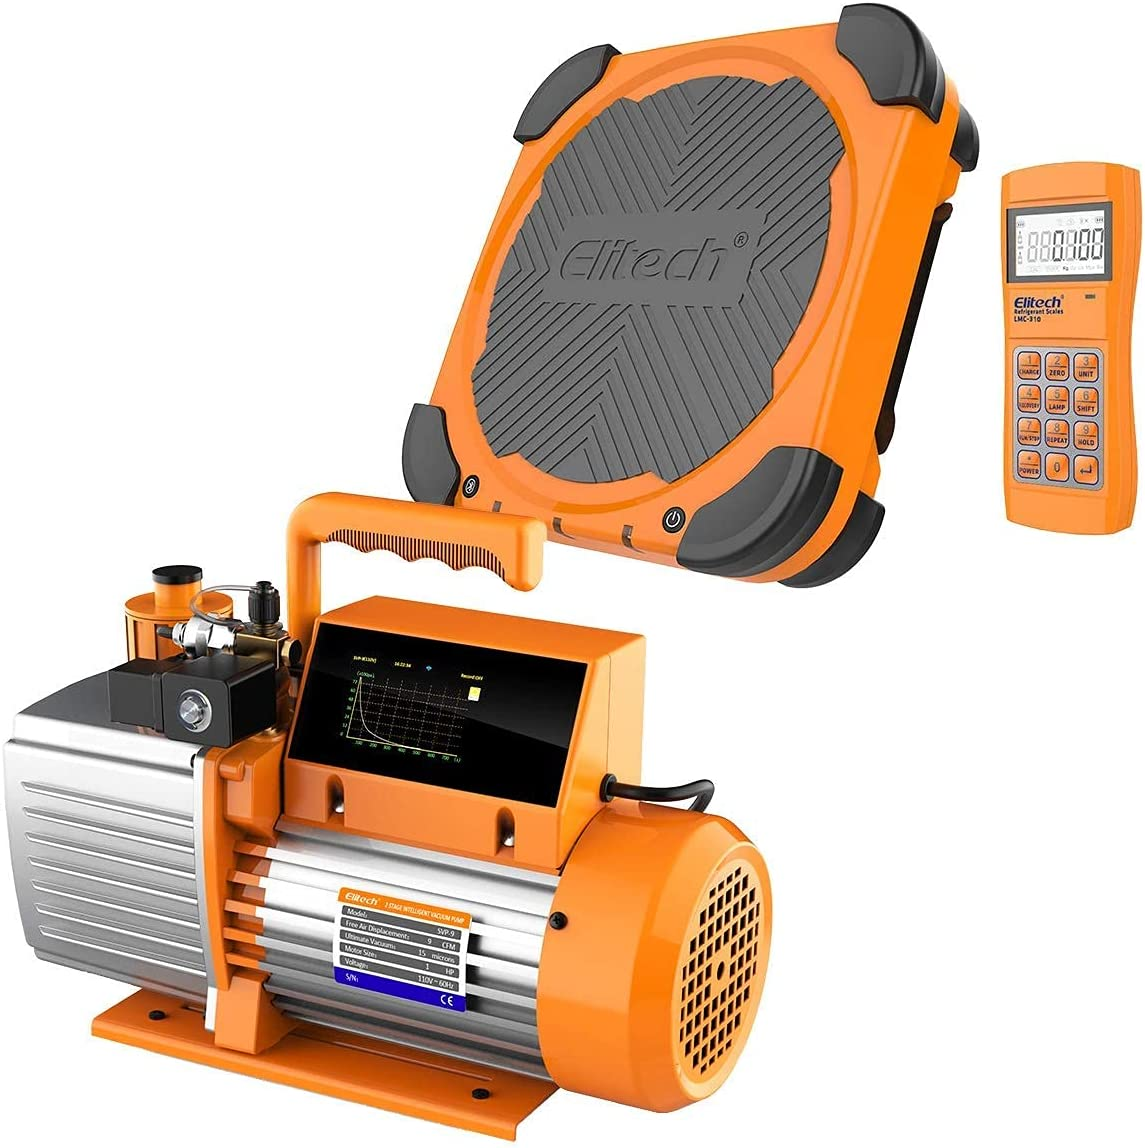 Elitech SVP-9 Vacuum Pump 9 El Paso Sales of SALE items from new works Mall CFM Intelligent LMC-310 2 HVAC Stage